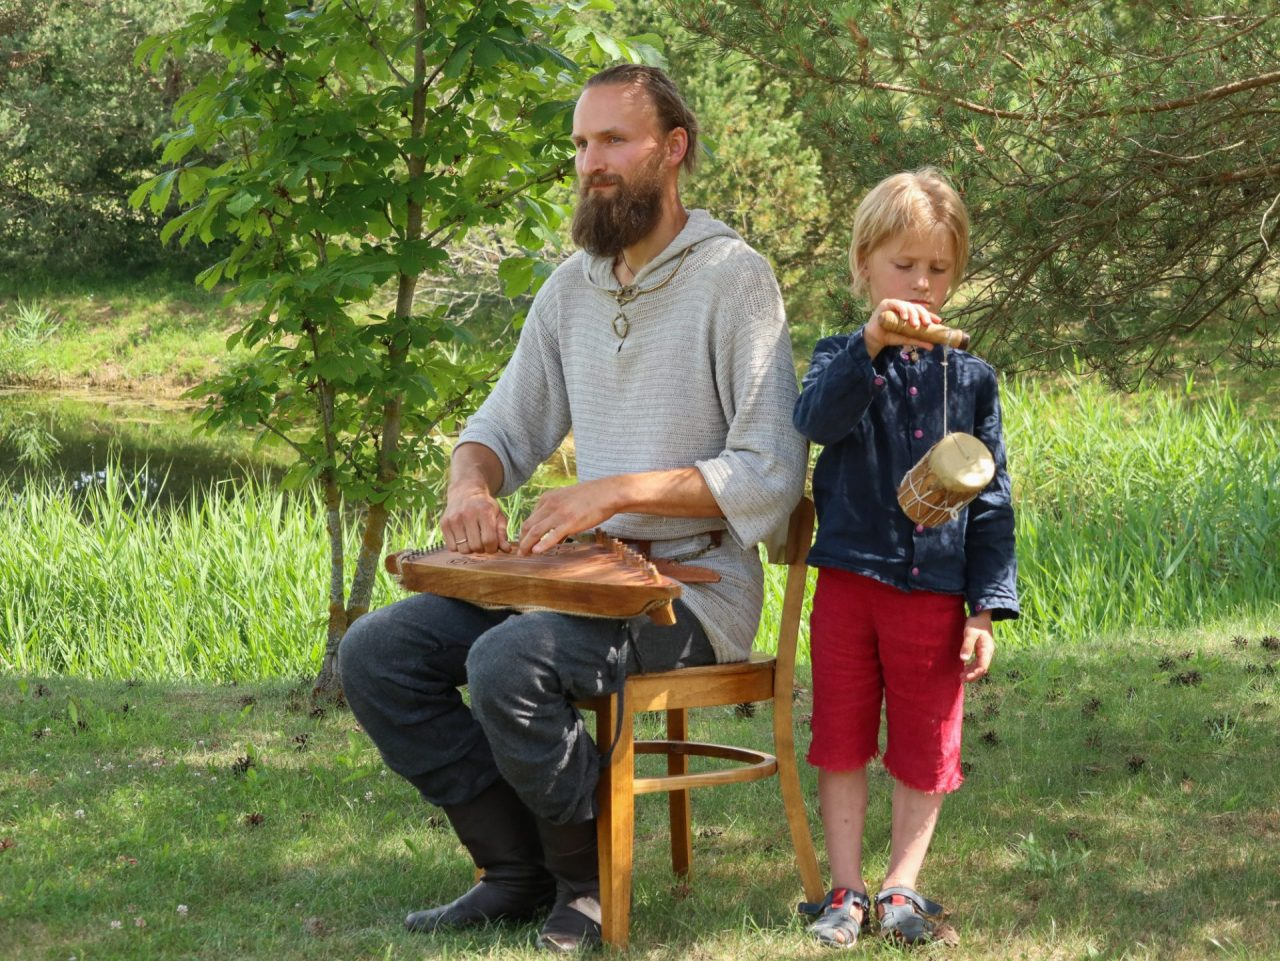 lituanie-siauliai-musicien-traditionnel-avec-son-fils-instrument-kankles